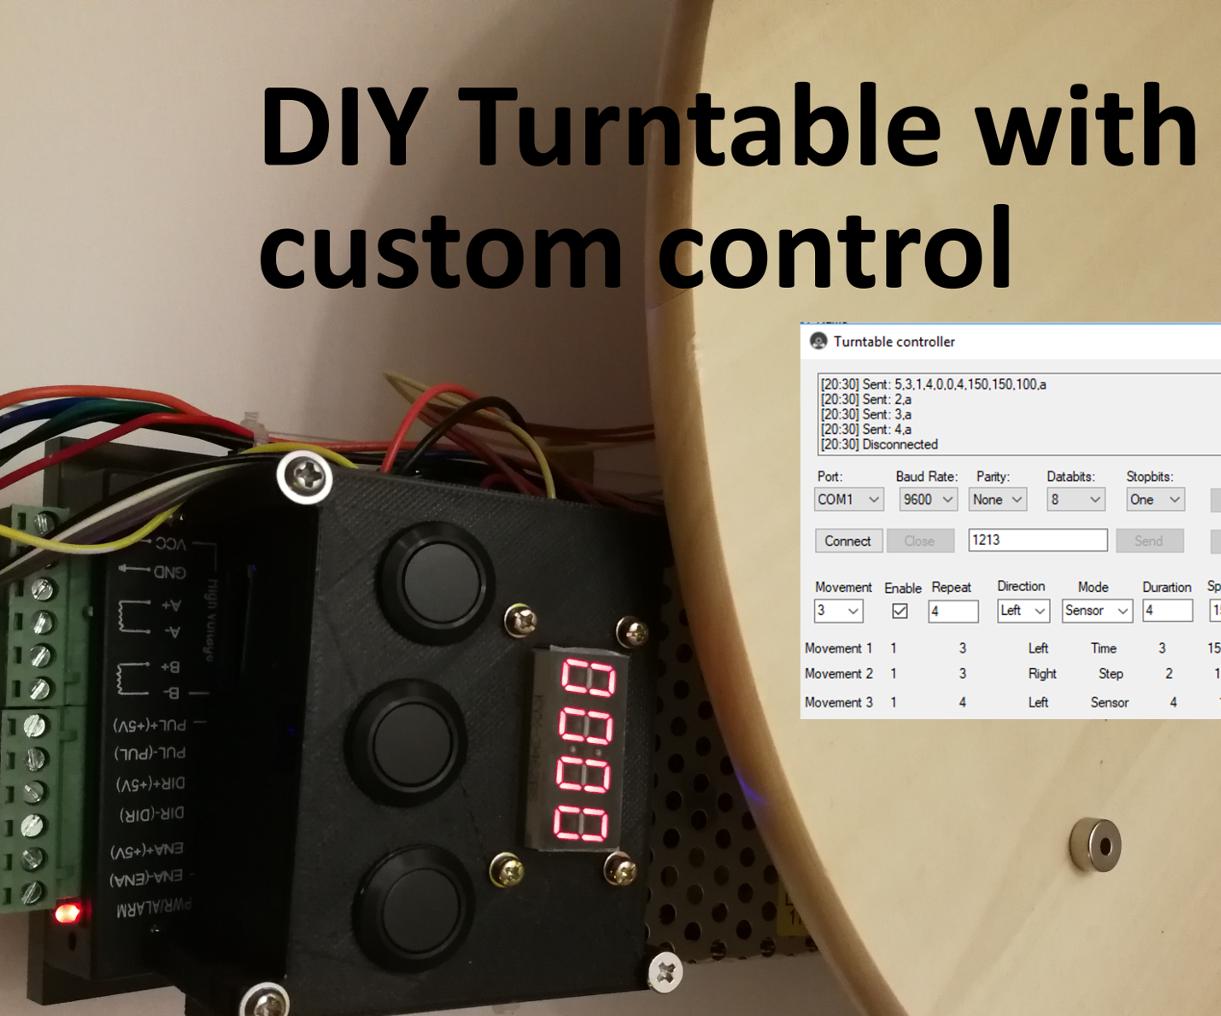 QnA VBage DIY Turntable With Custom Control